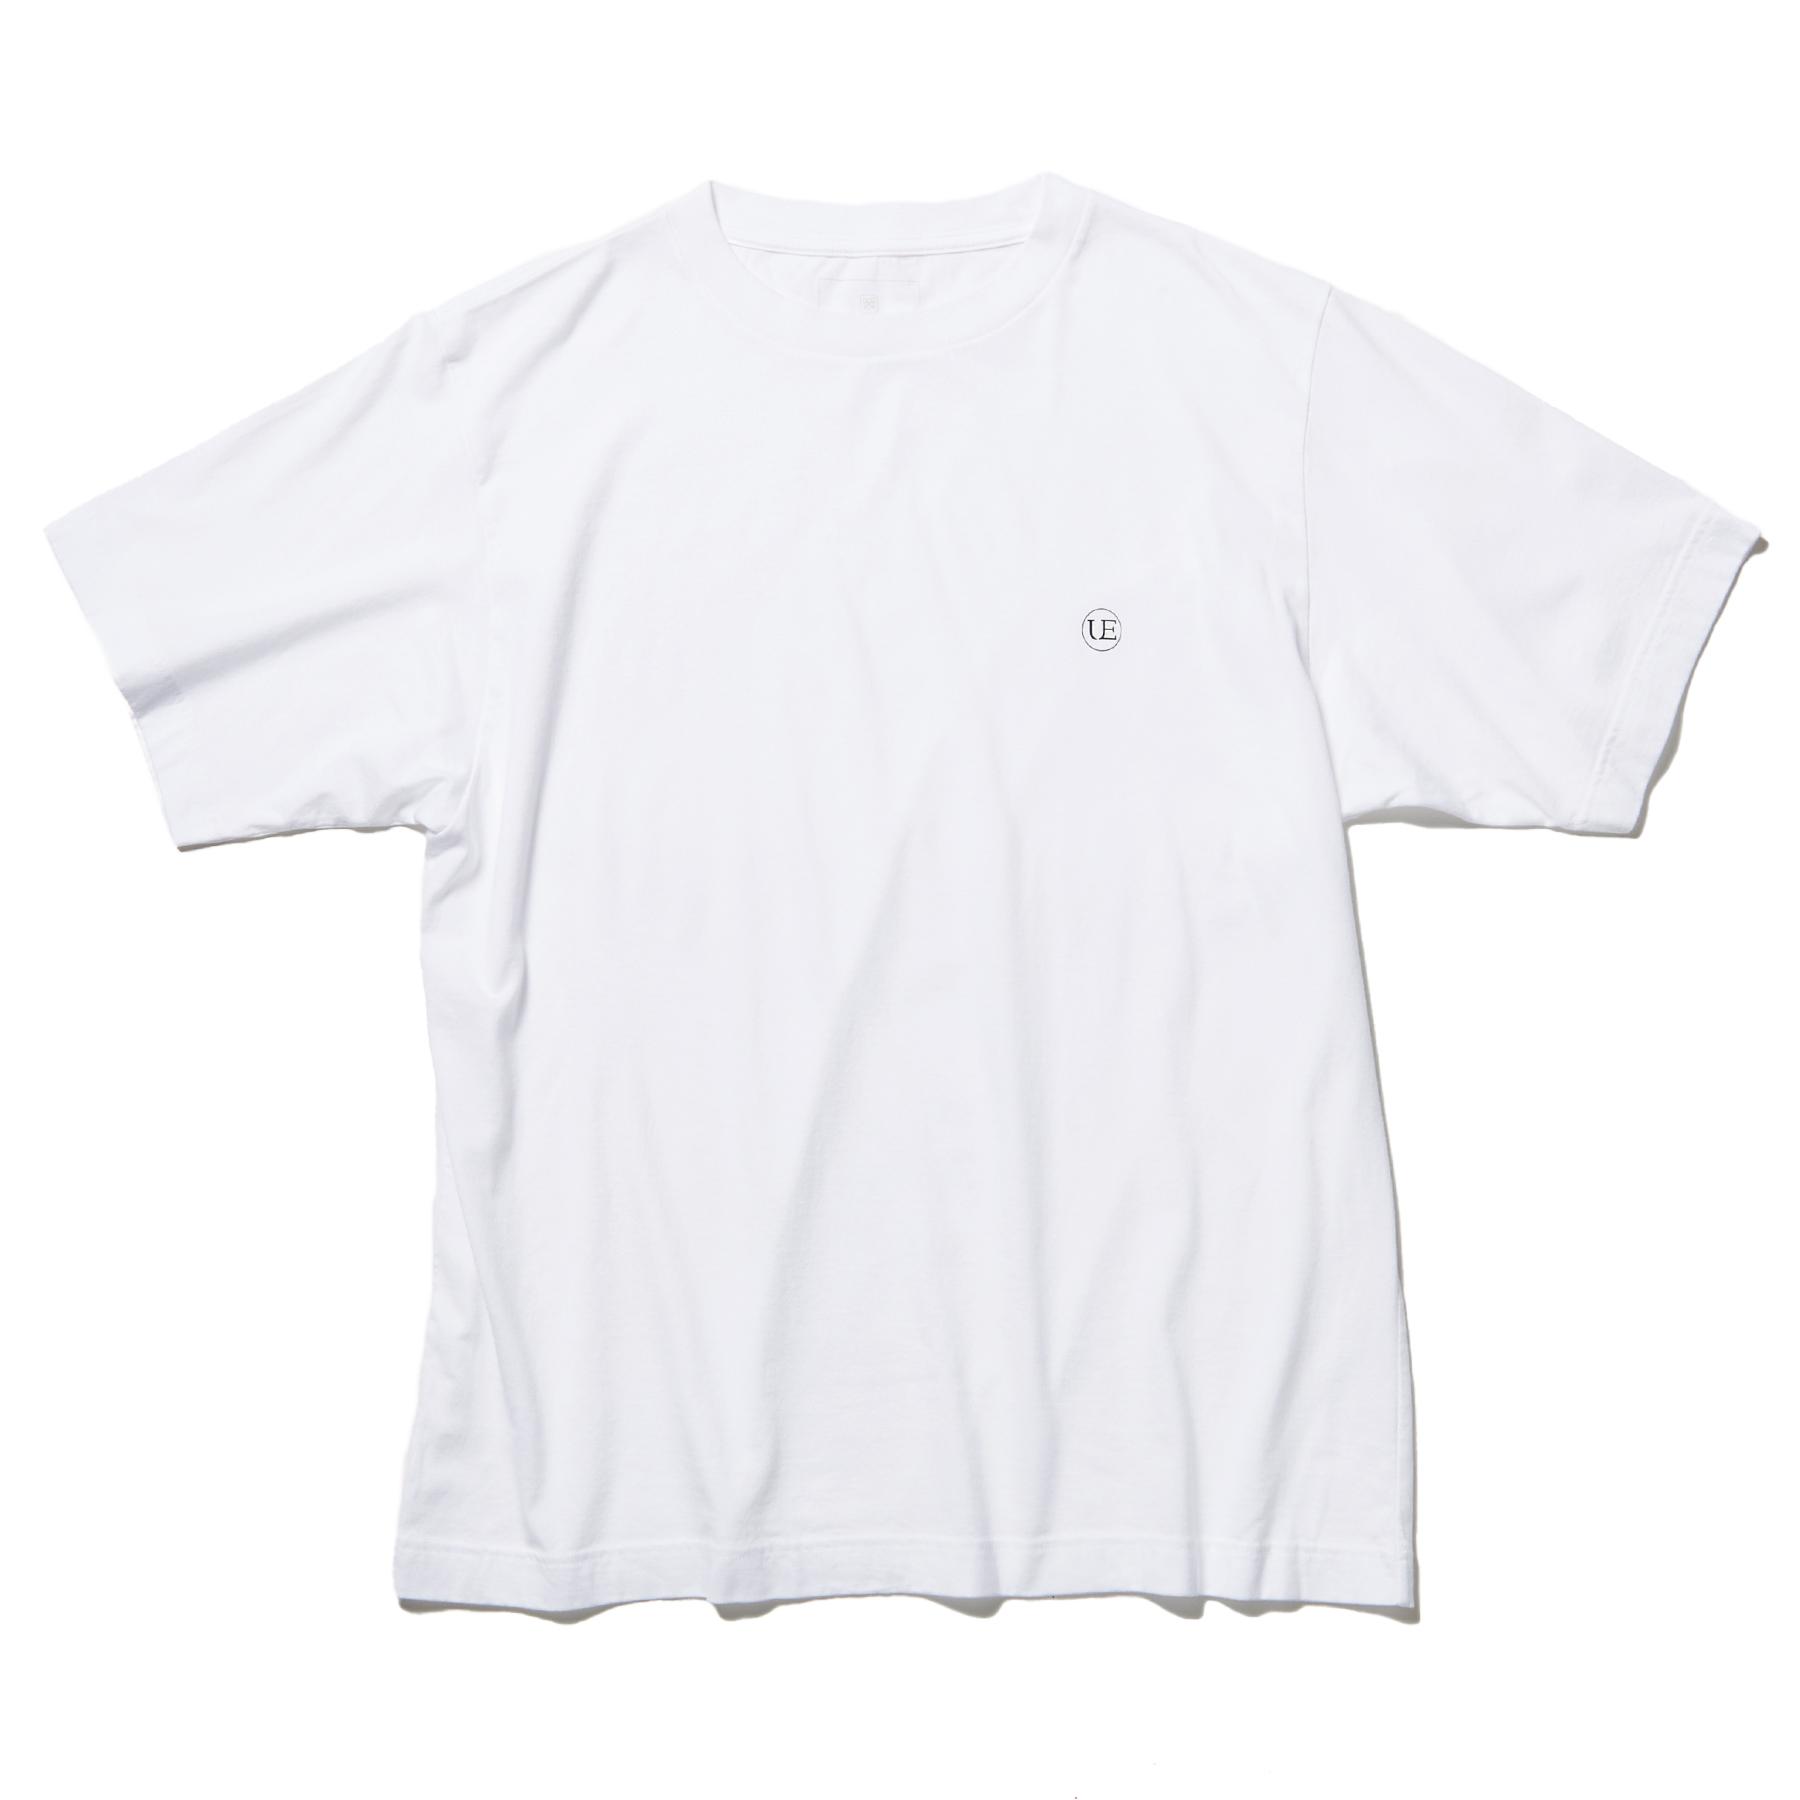 uniform experiment / AUTHENTIC WIDE CIRCLE LOGO TEE (White)